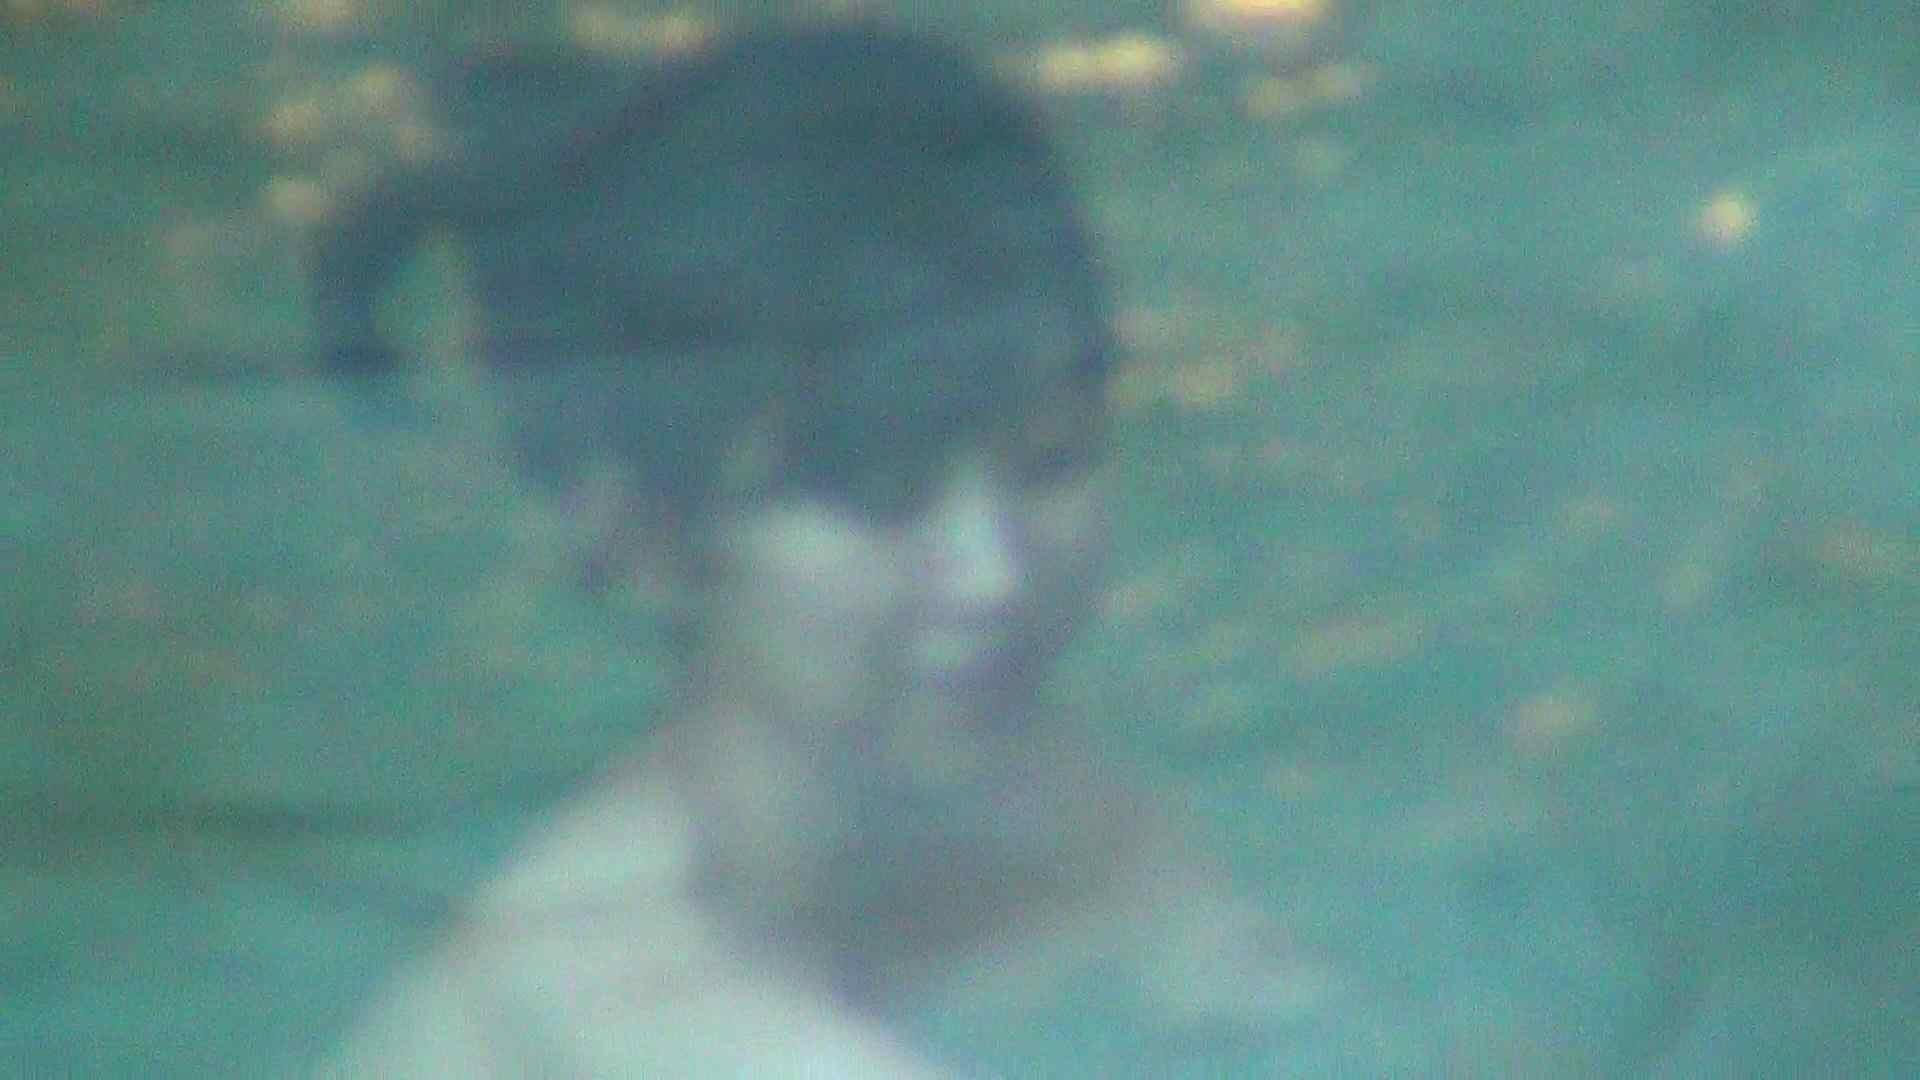 Aquaな露天風呂Vol.294 OLセックス | 盗撮  75画像 49